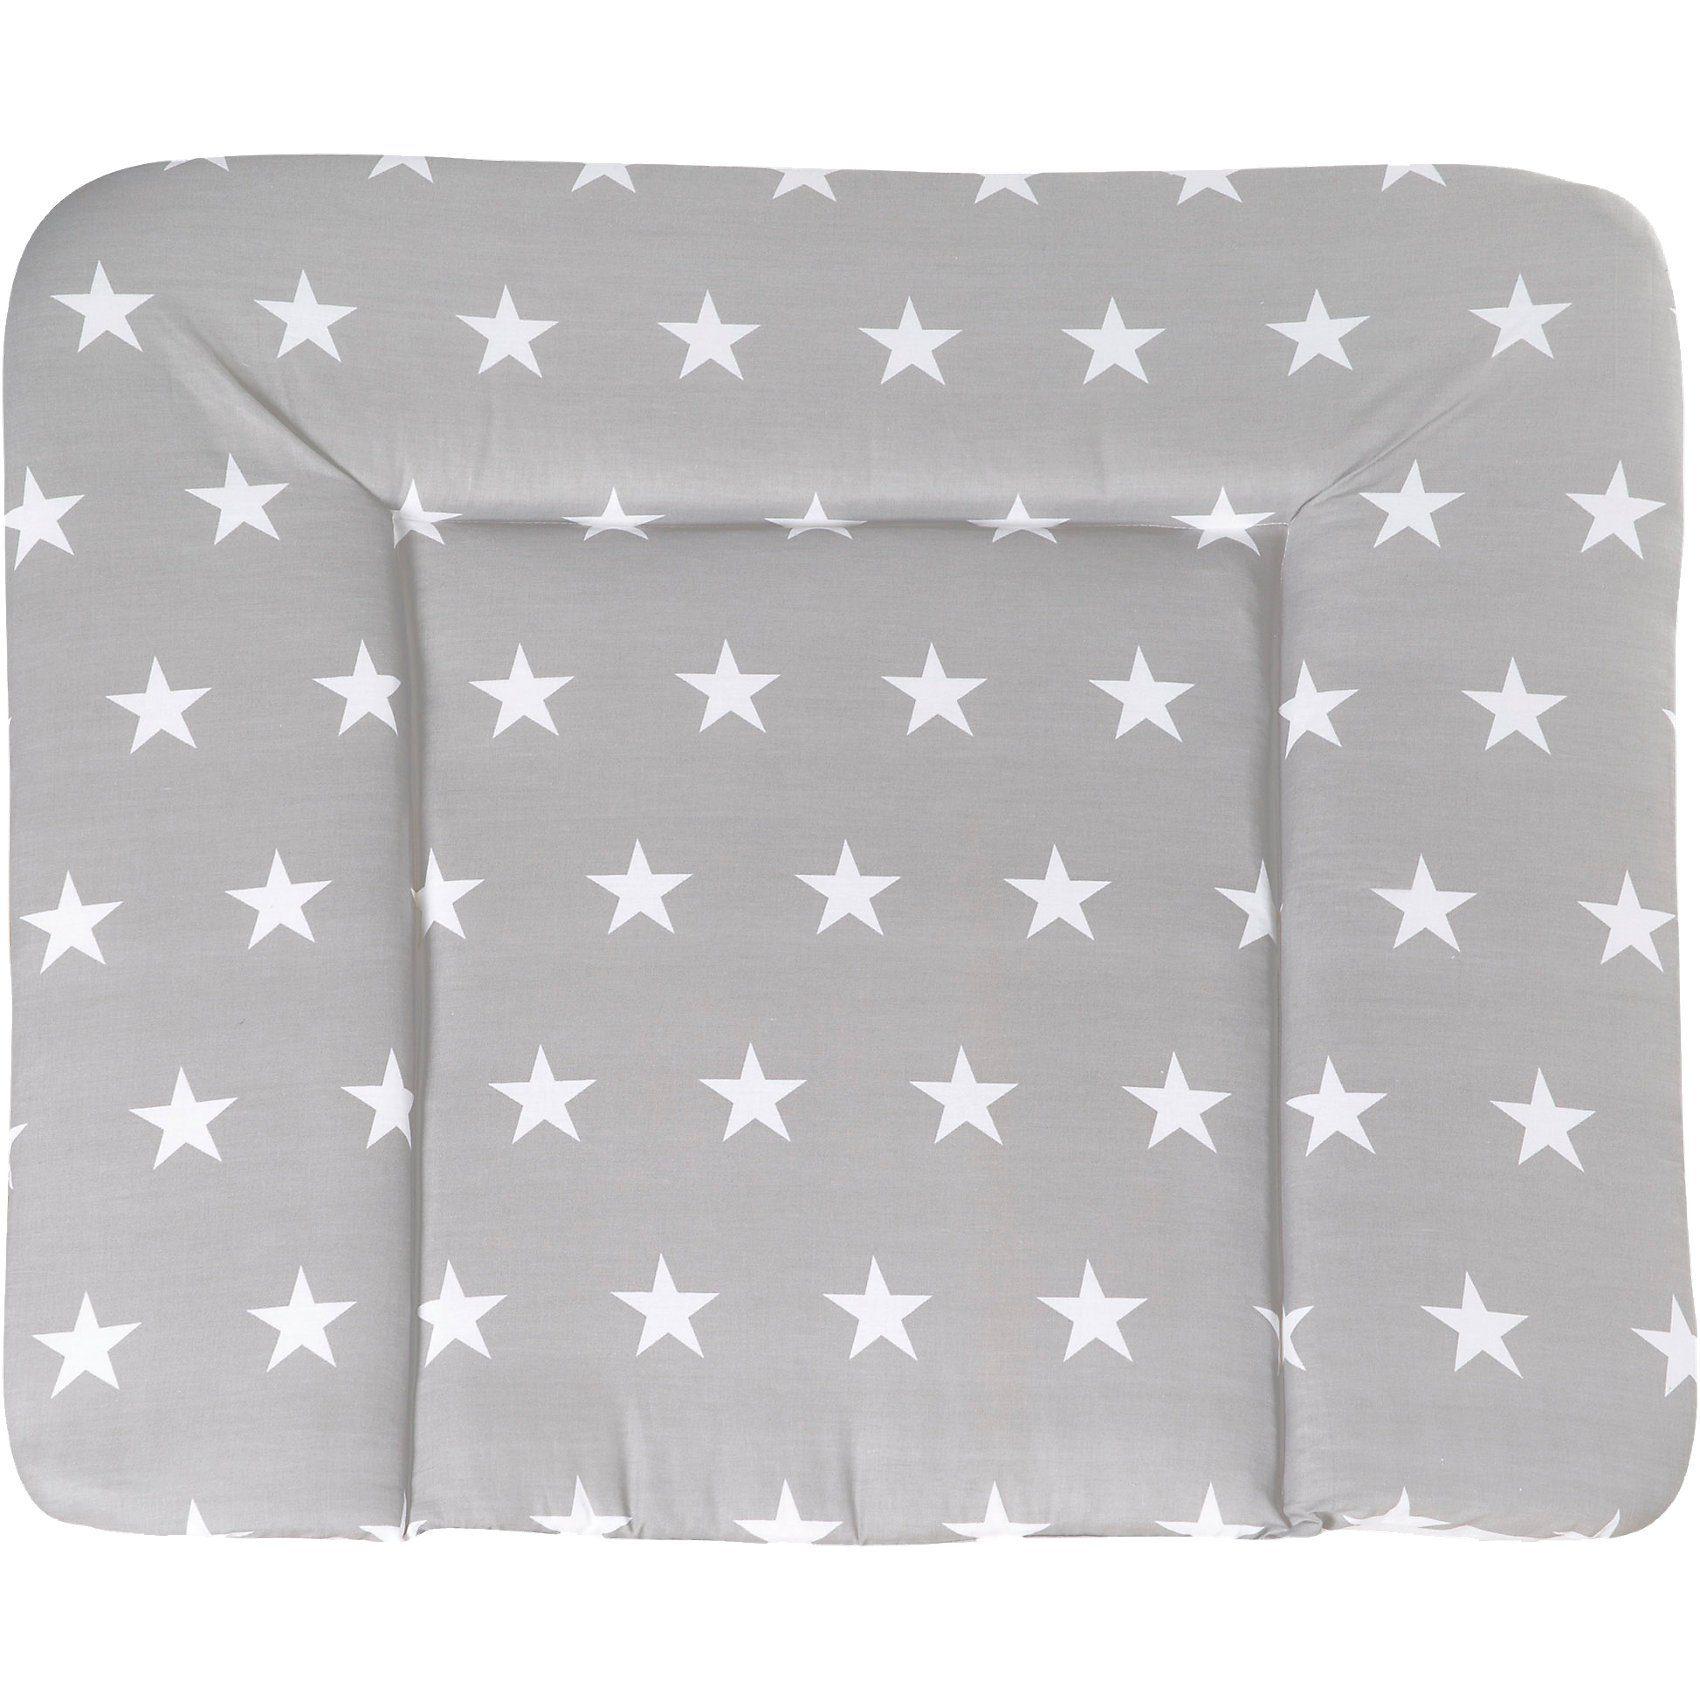 Roba® Wickelauflage Soft, Little Star grau, 85 x 75 cm